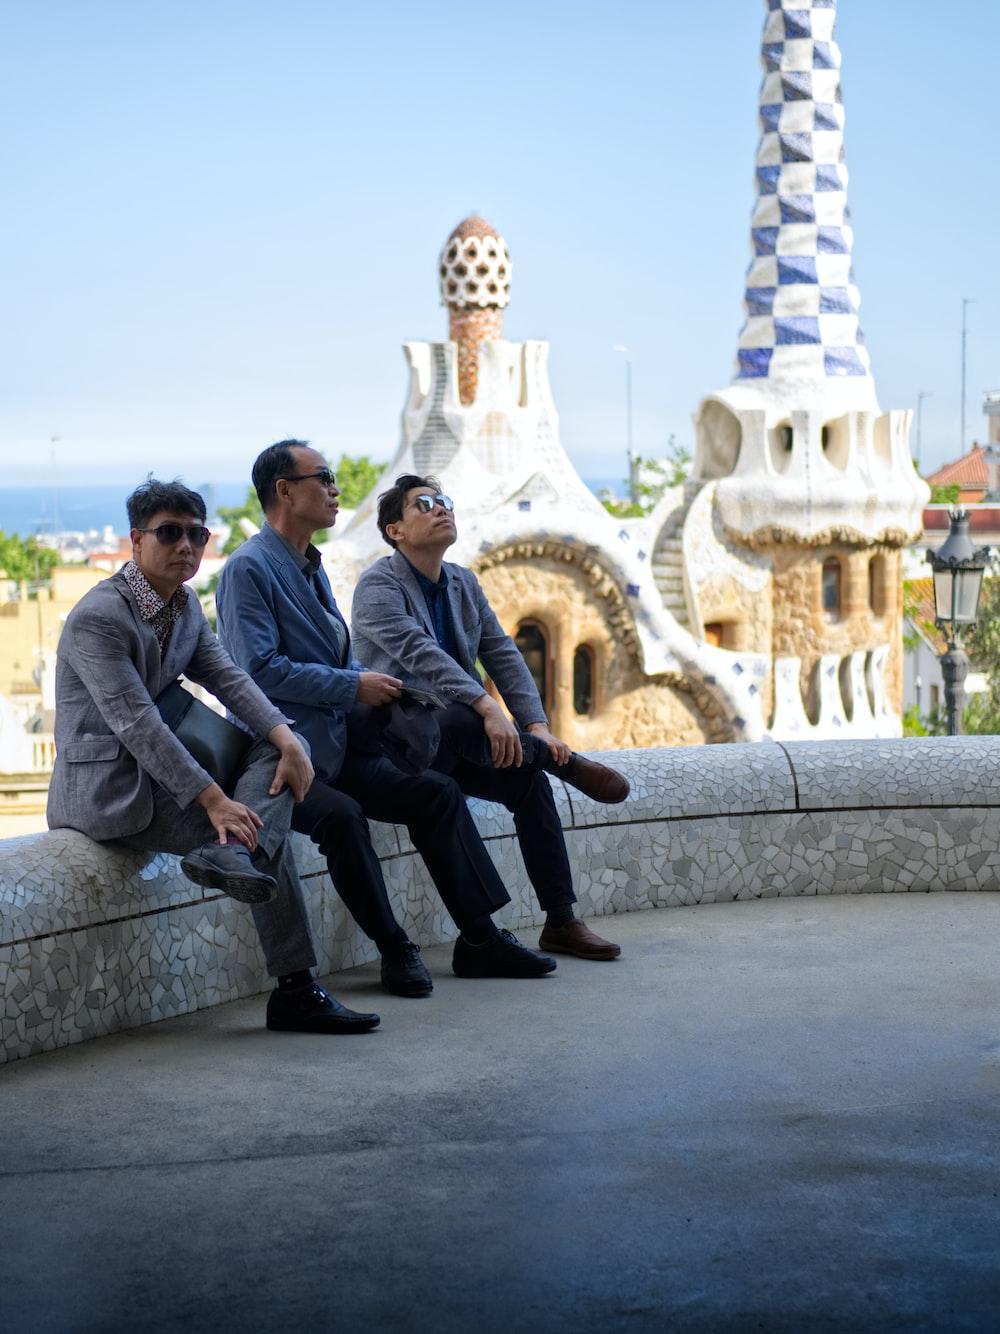 three men sitting on concrete bench